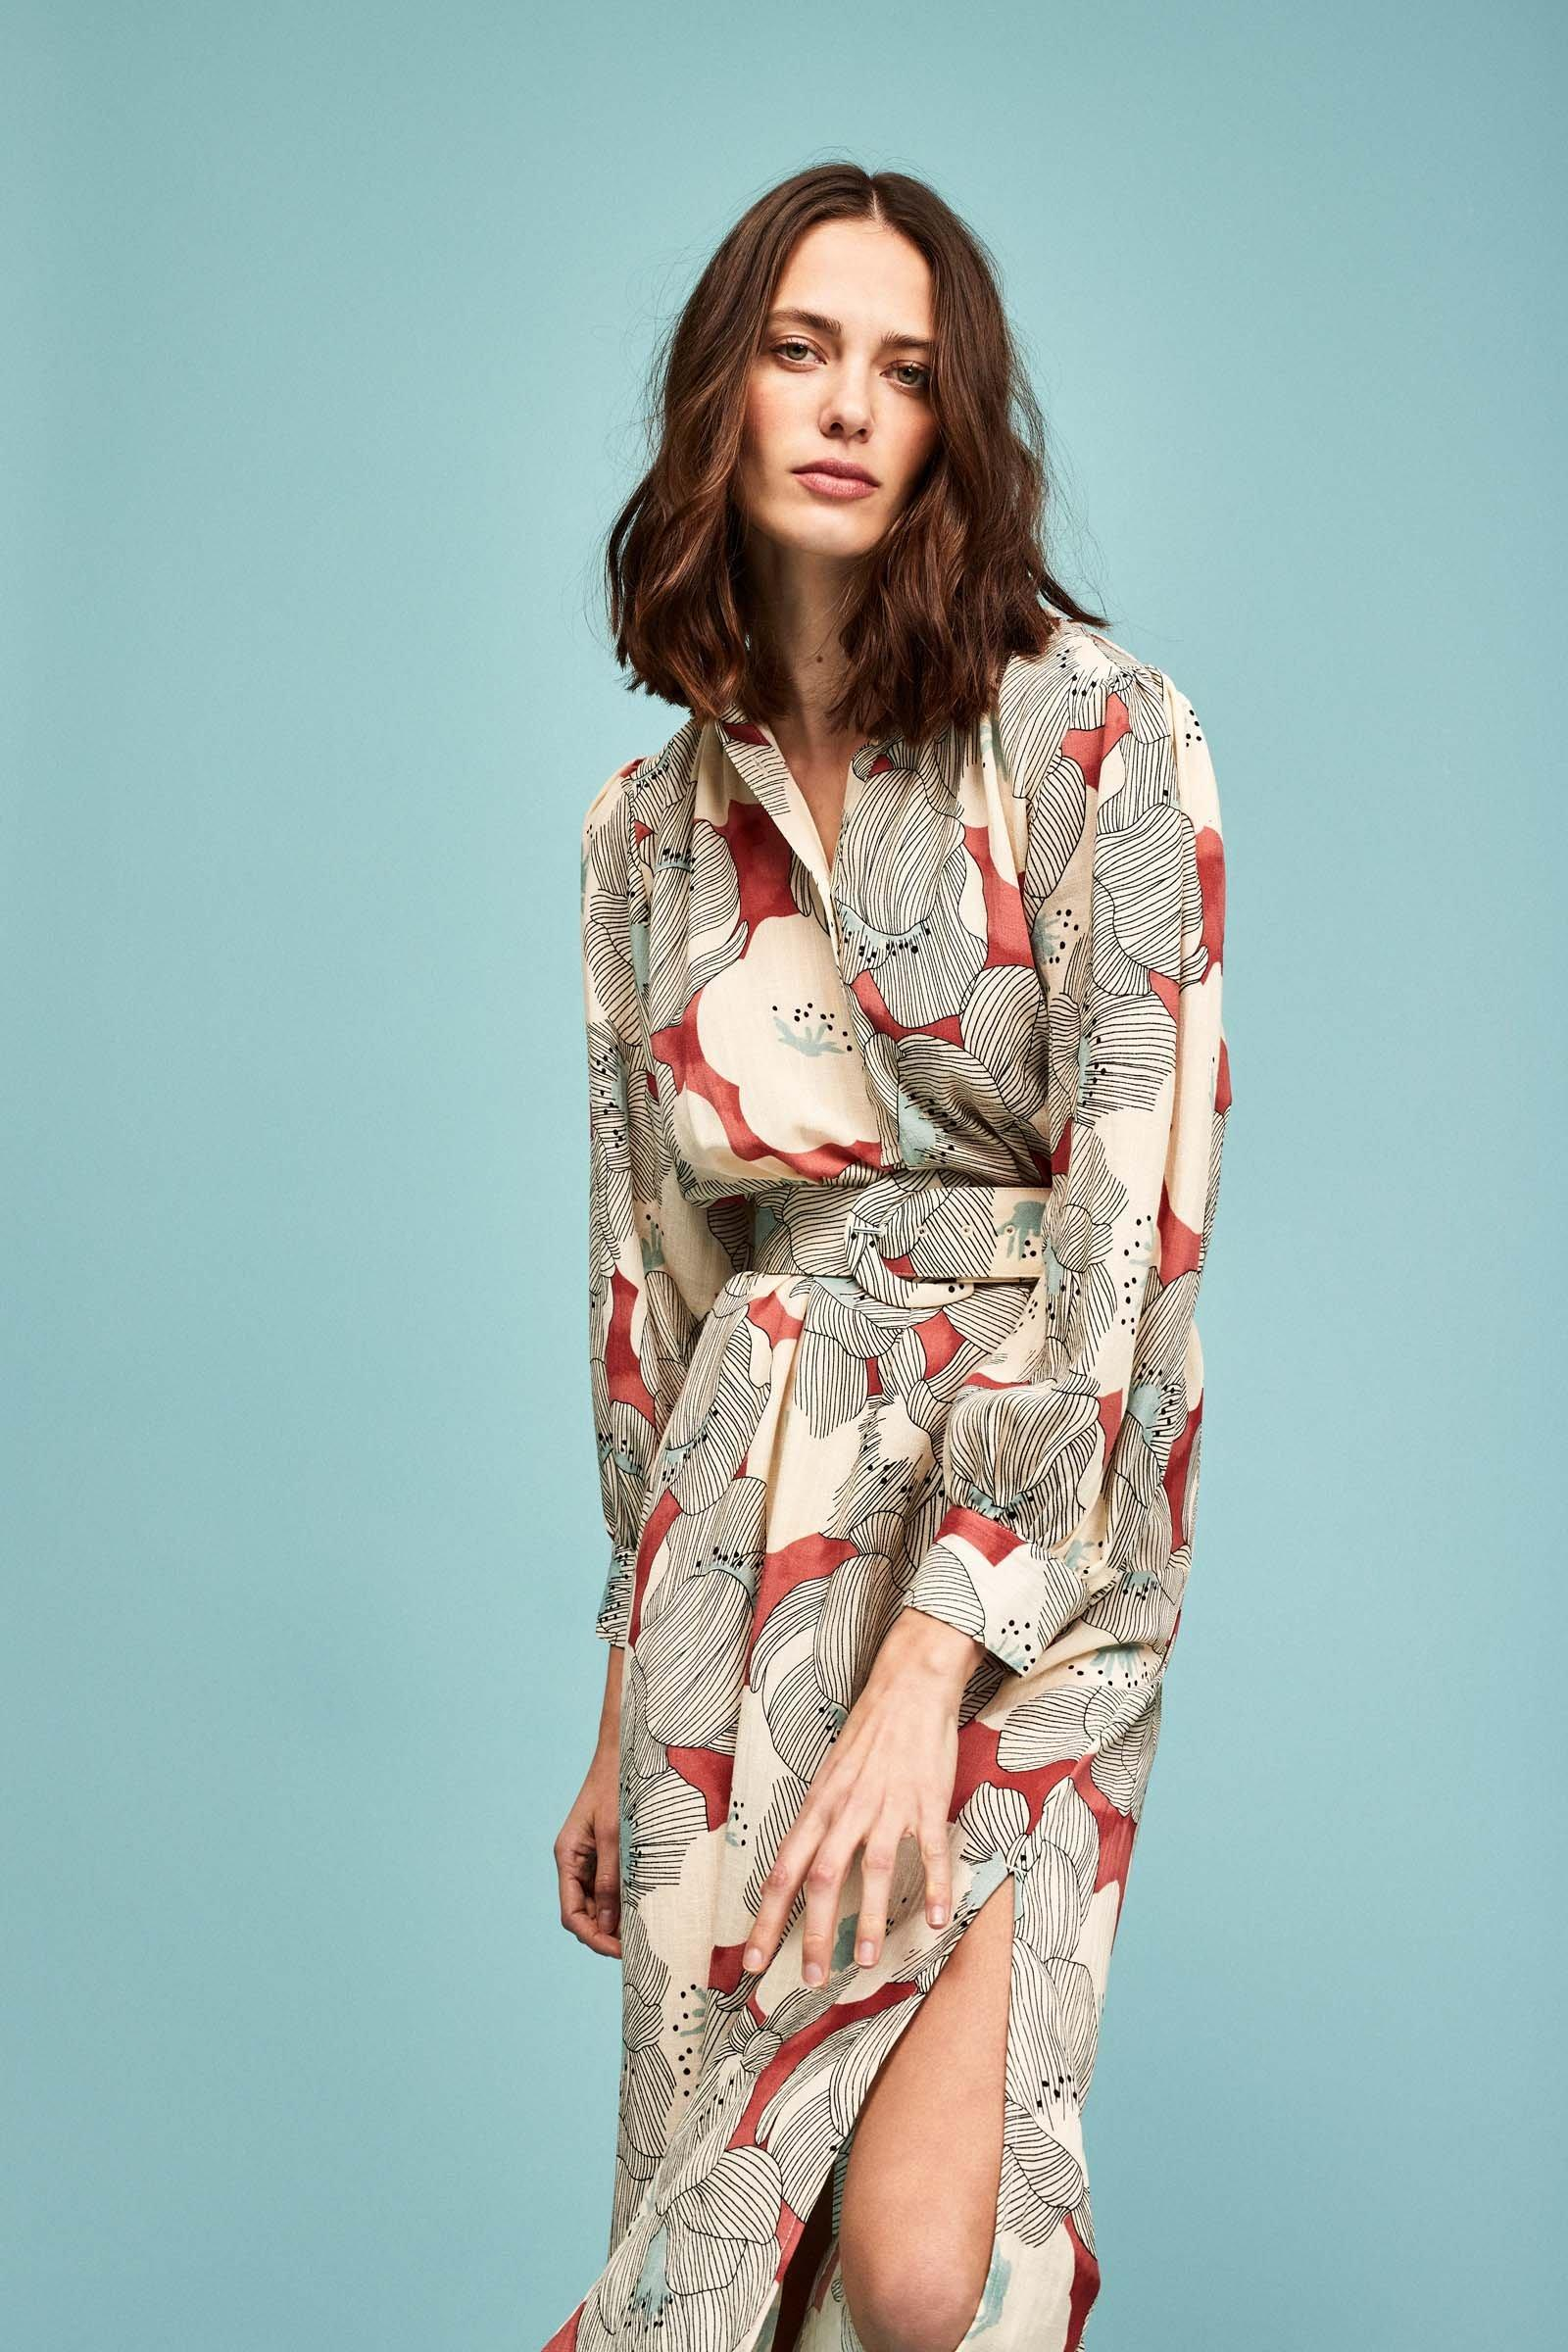 https://webmedia.cks-fashion.com/i/cks/123301ASM_10_l_model